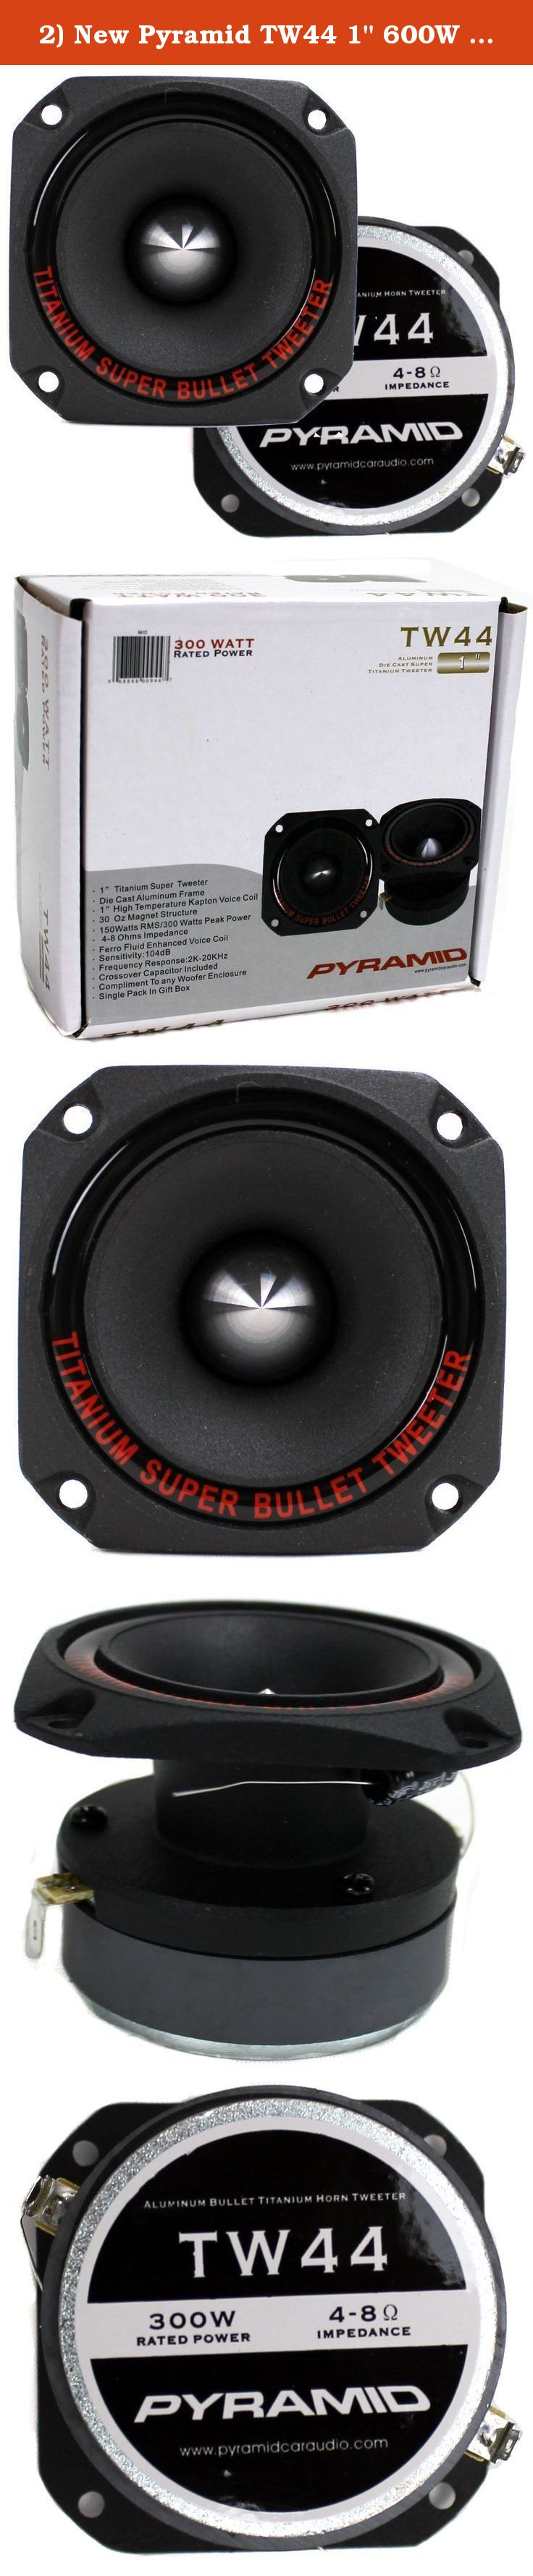 Pyle-Pro PDBT45 400 Watt 1.75-inch Titanium Bullet Super Tweeter